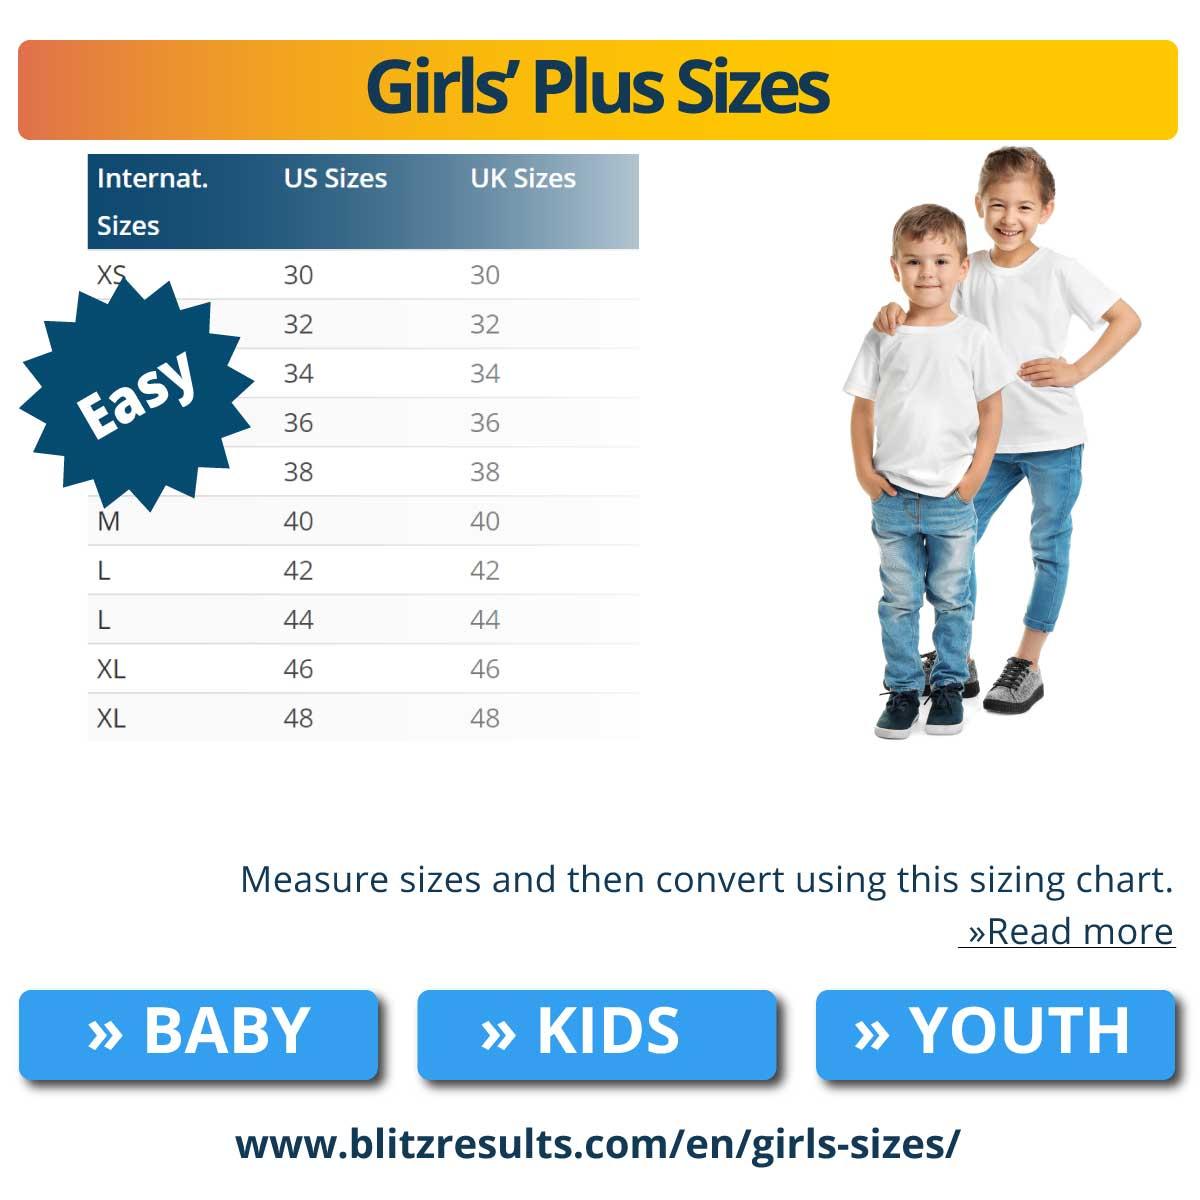 Girls' Plus Sizes